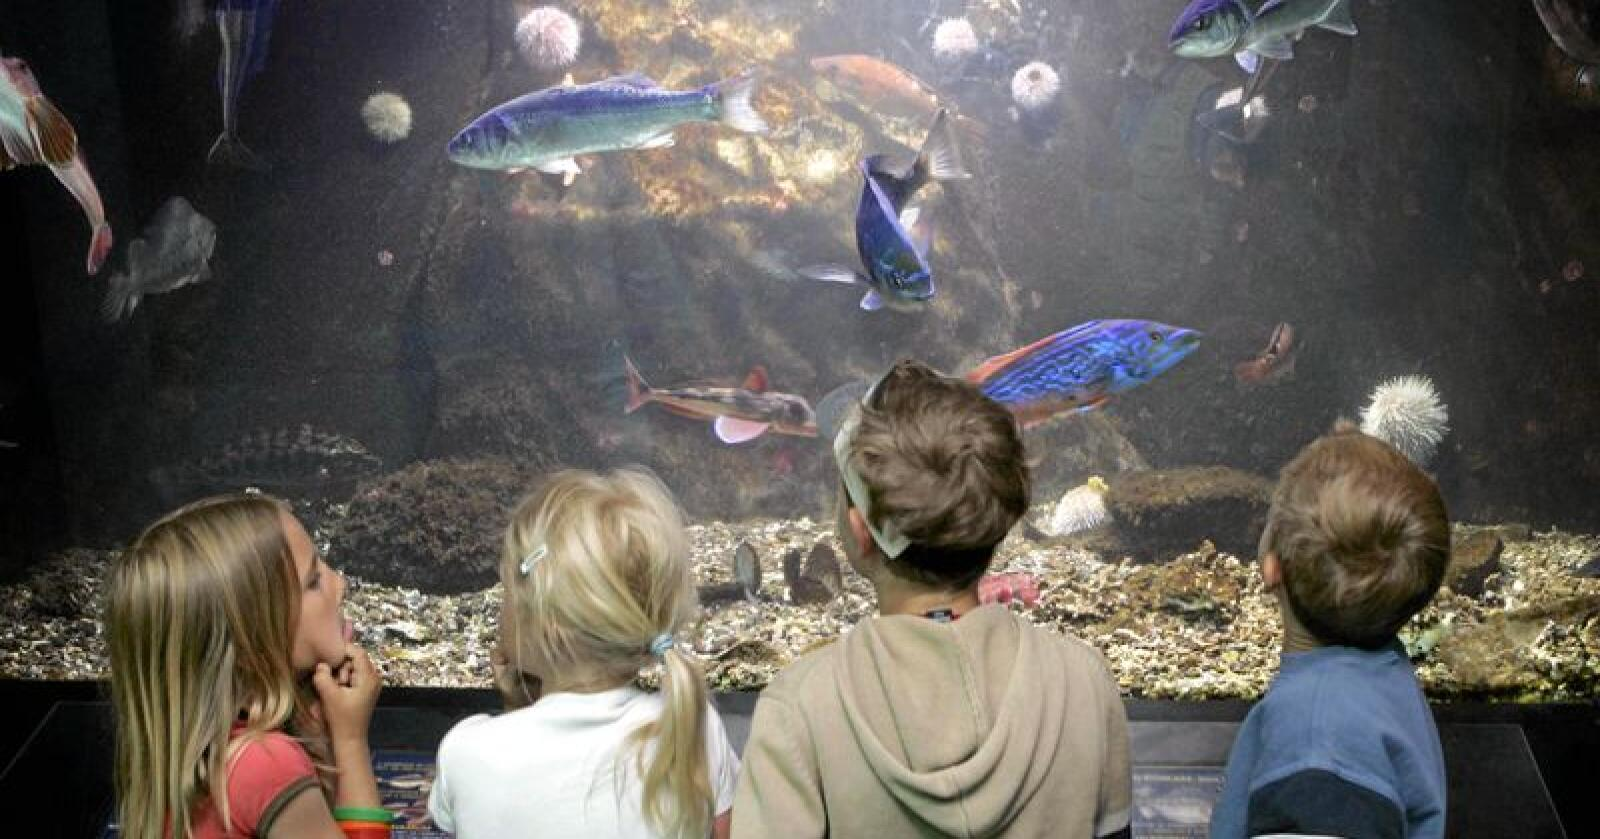 Skapninger: Forestillingen om at fisk er primitive og dumme skapninger stemmer ikke. Foto Knut Falch/NTB scanpix